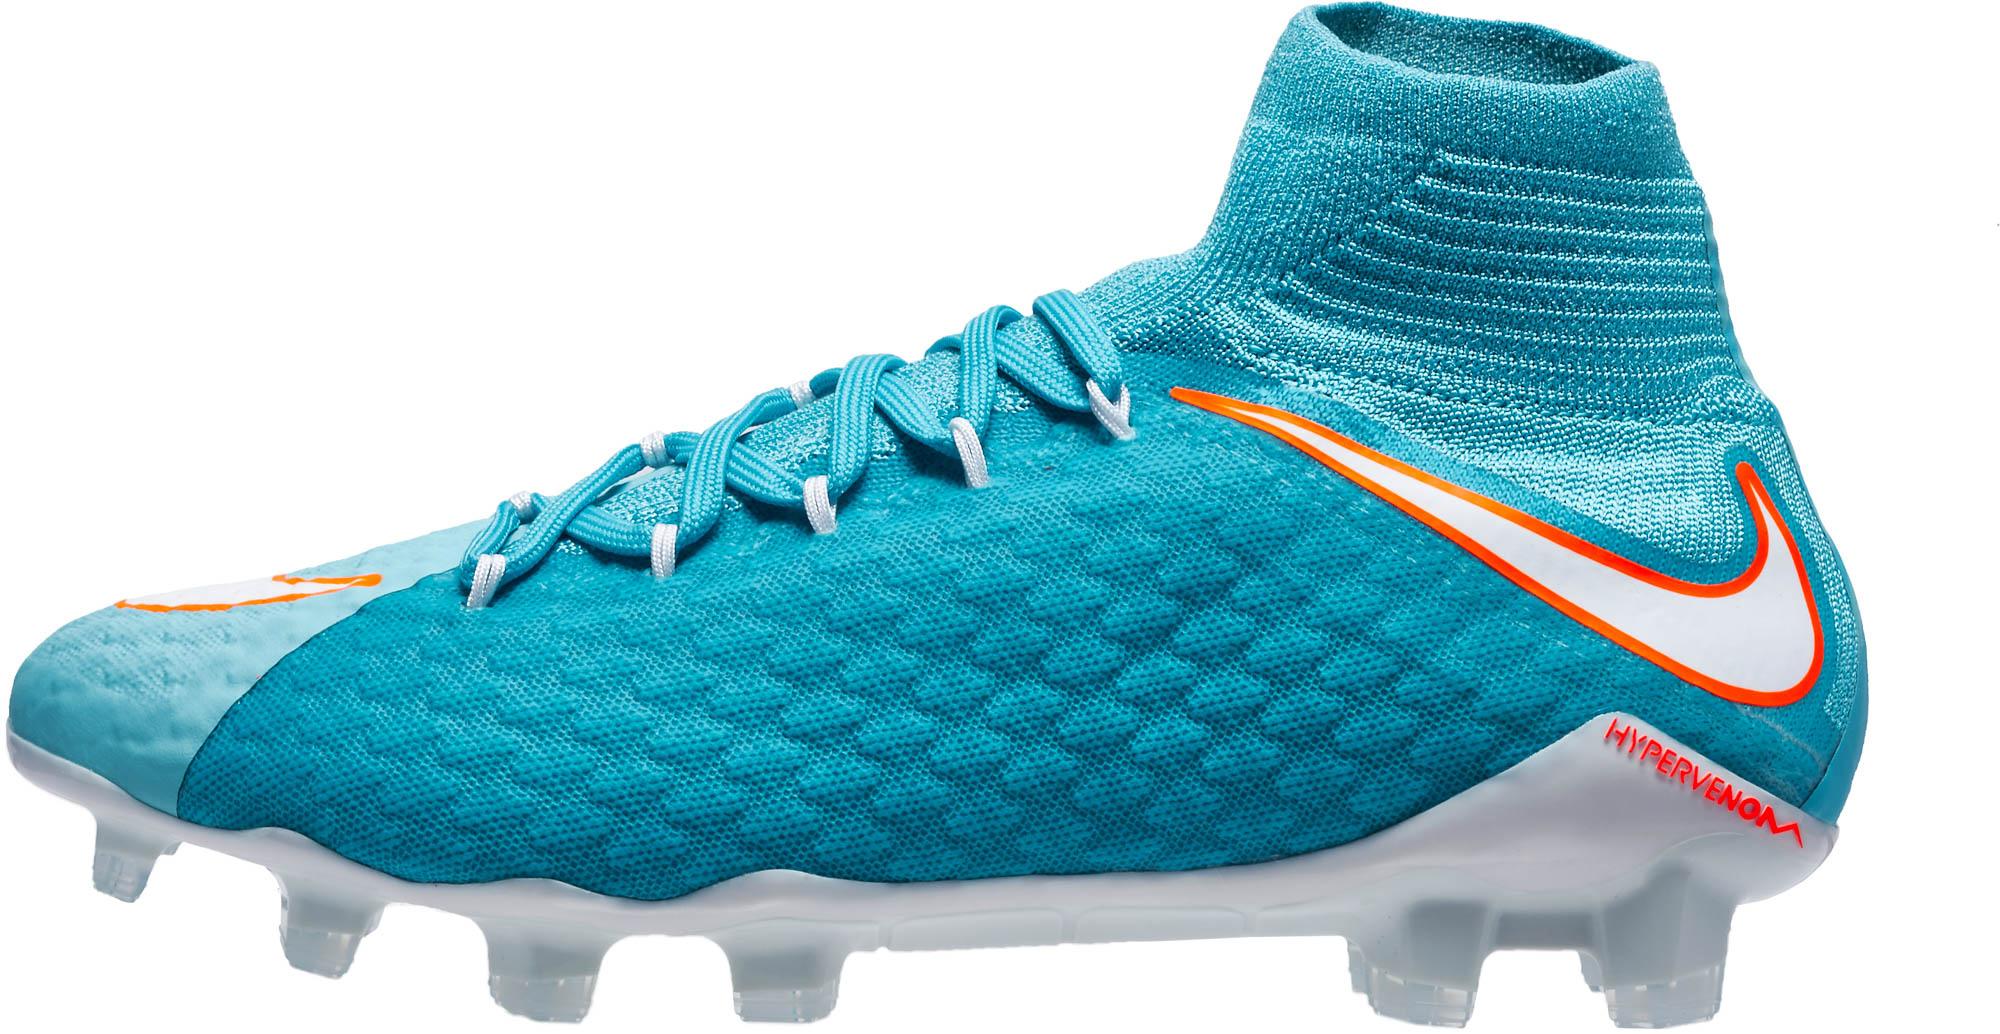 Nike Womens Hypervenom Phatal III DF FG Soccer Cleats - Polarized ... 032eef1559